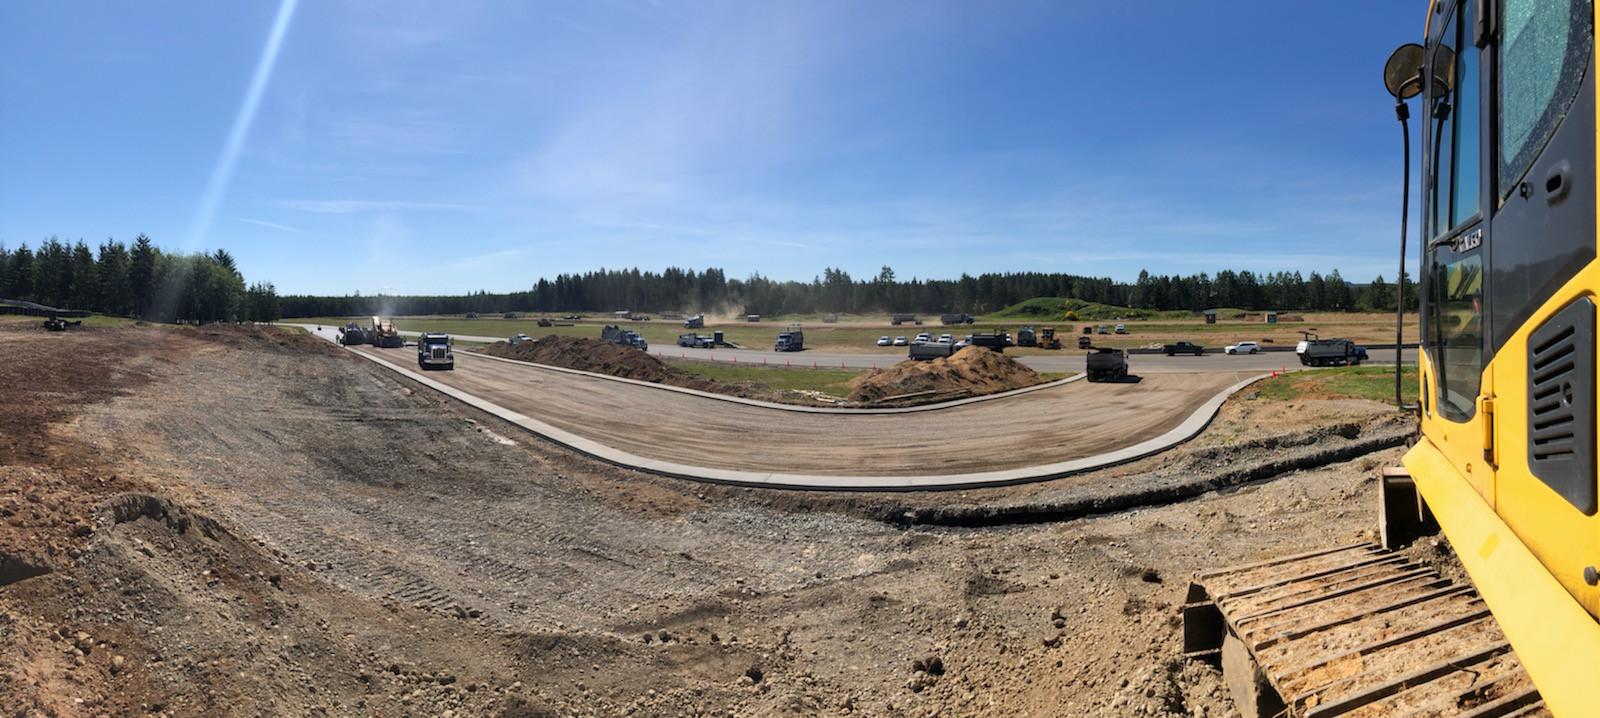 The new chicane at Ridge Motorsports Park under construction. Photo courtesy Ridge Motorsports Park.